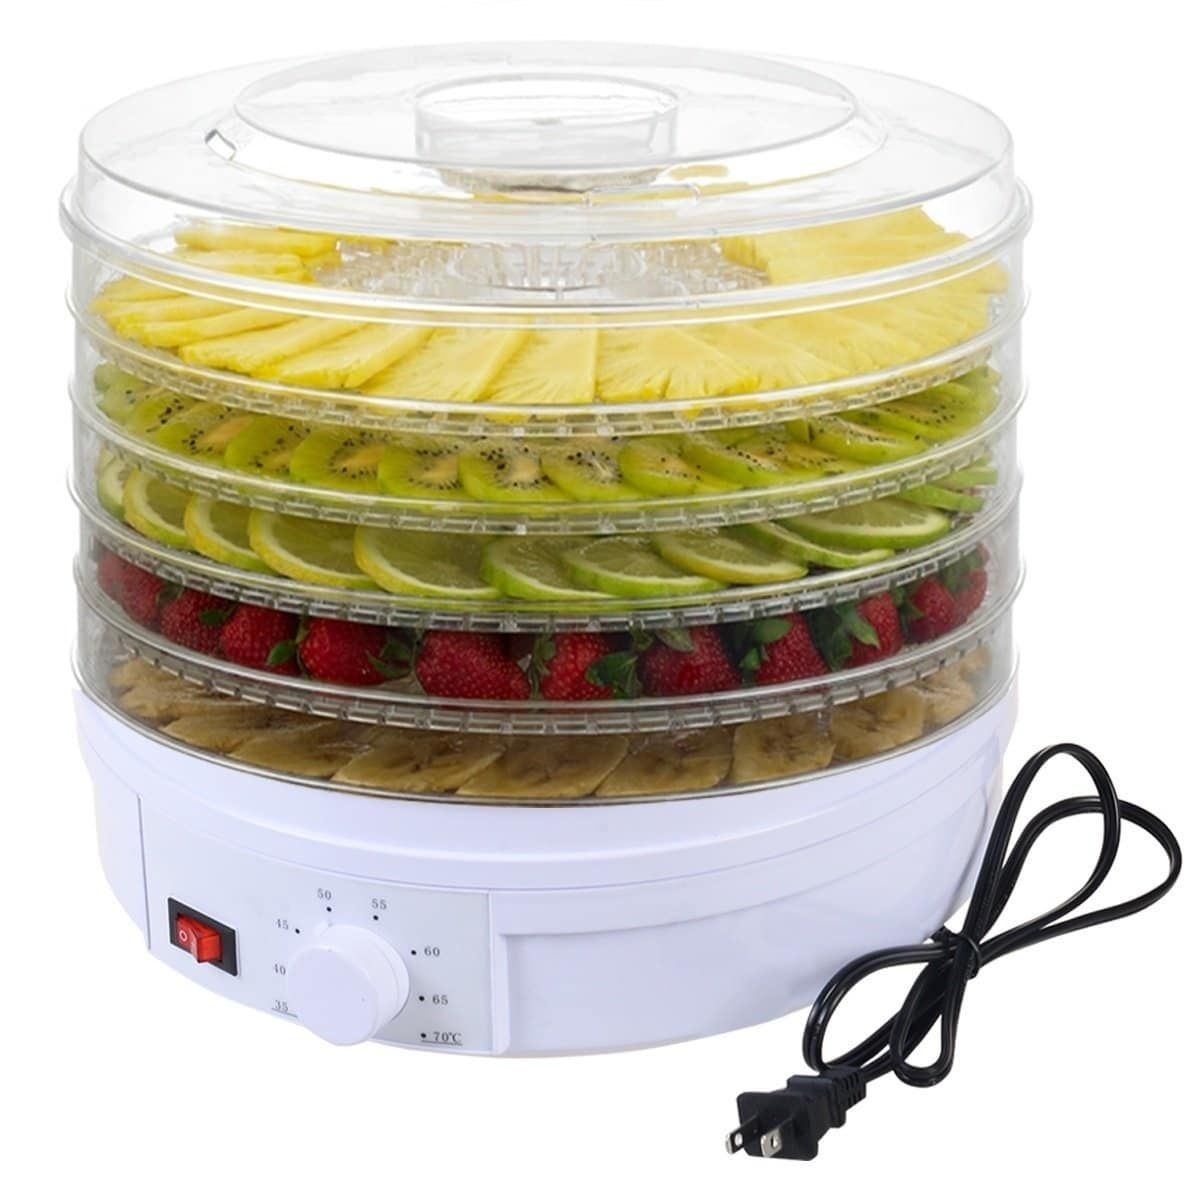 J Jati 5 Tray Electric Food Dehydrator White Products In